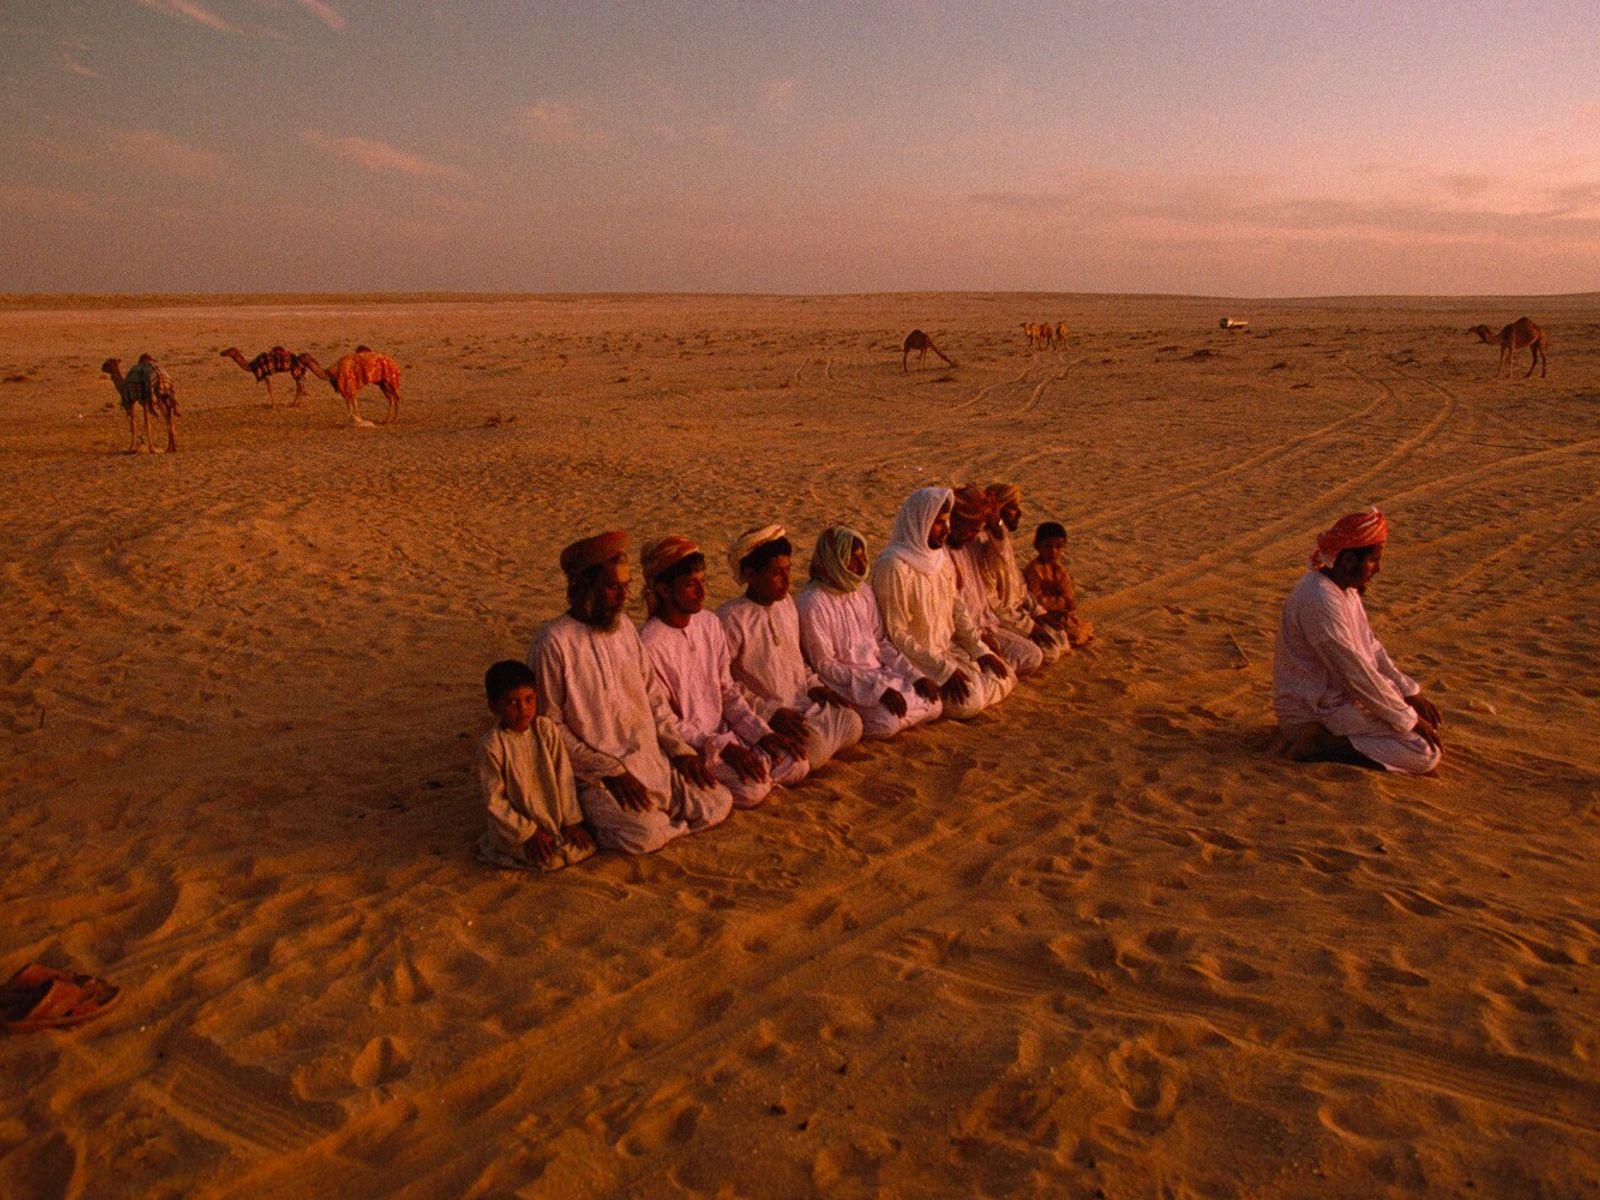 Omã, 1992: Beduínos Hamad Haraiz Harsousi fazem orações noturnas em Jiddat al Harasis, um deserto famoso ...